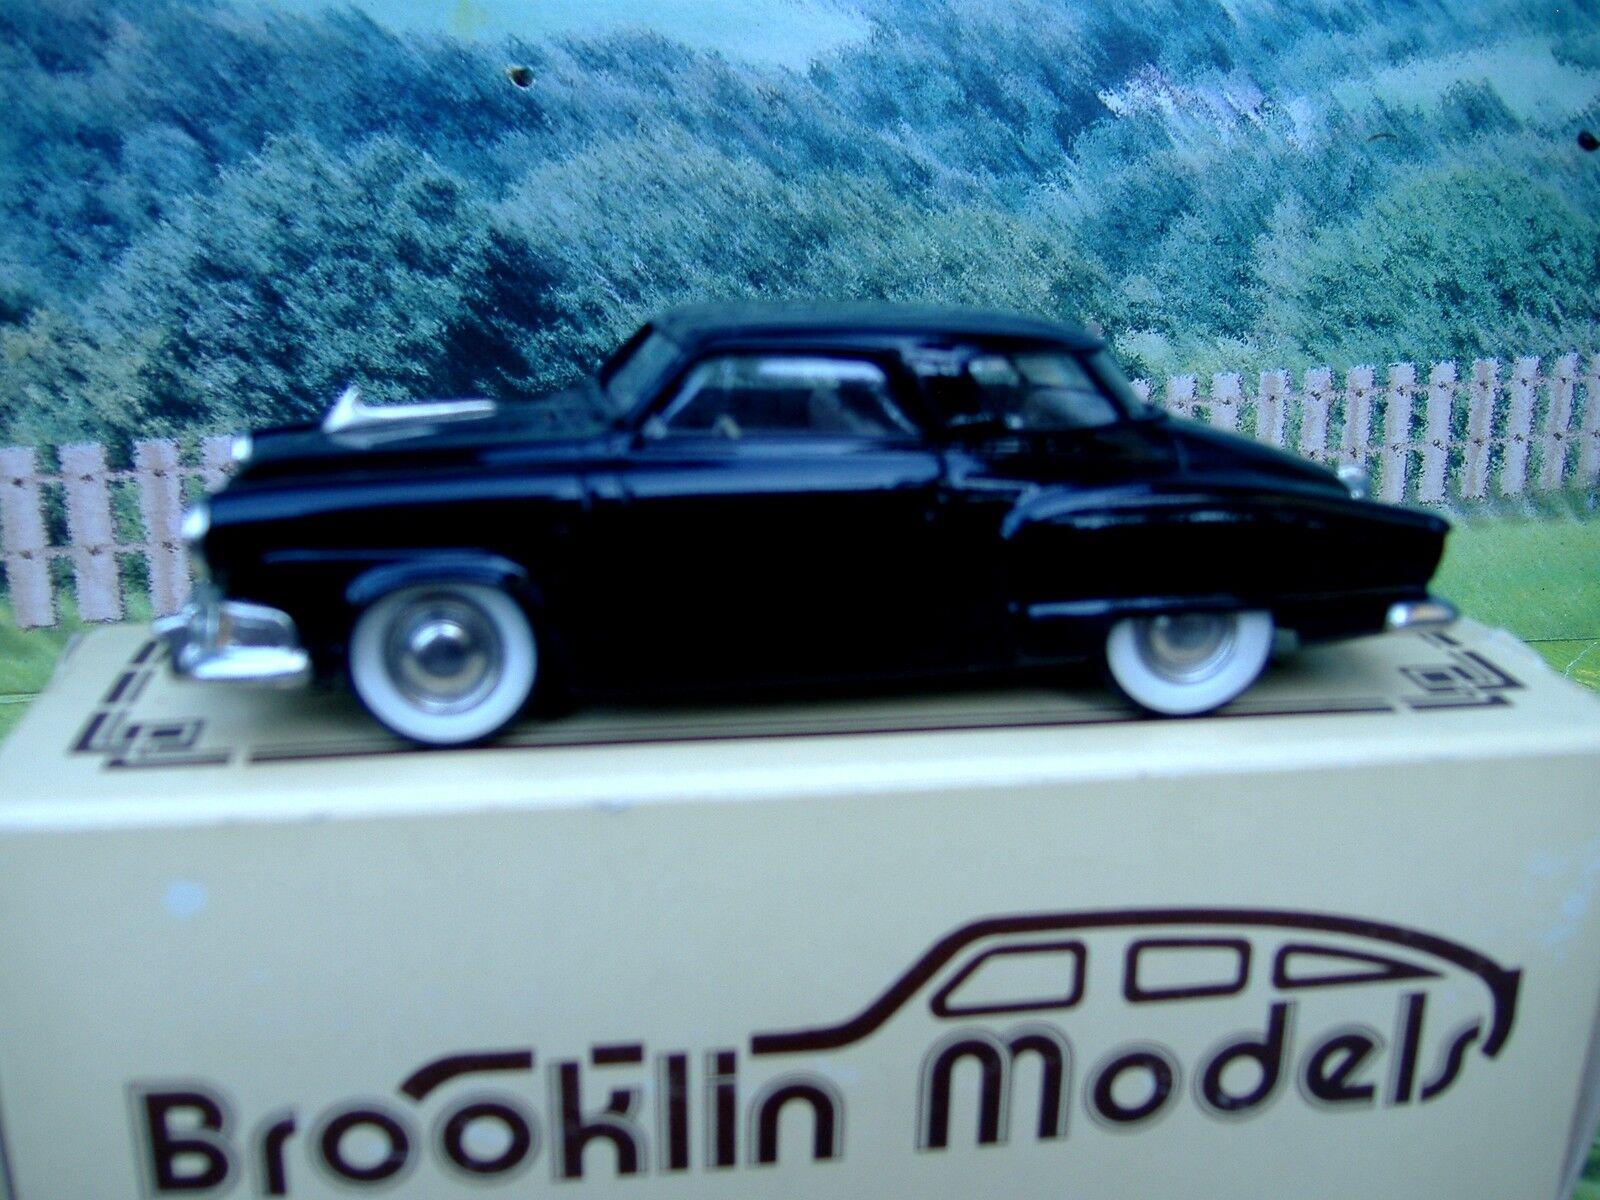 1 43 Brooklin models  1952 Studebaker champion white metal